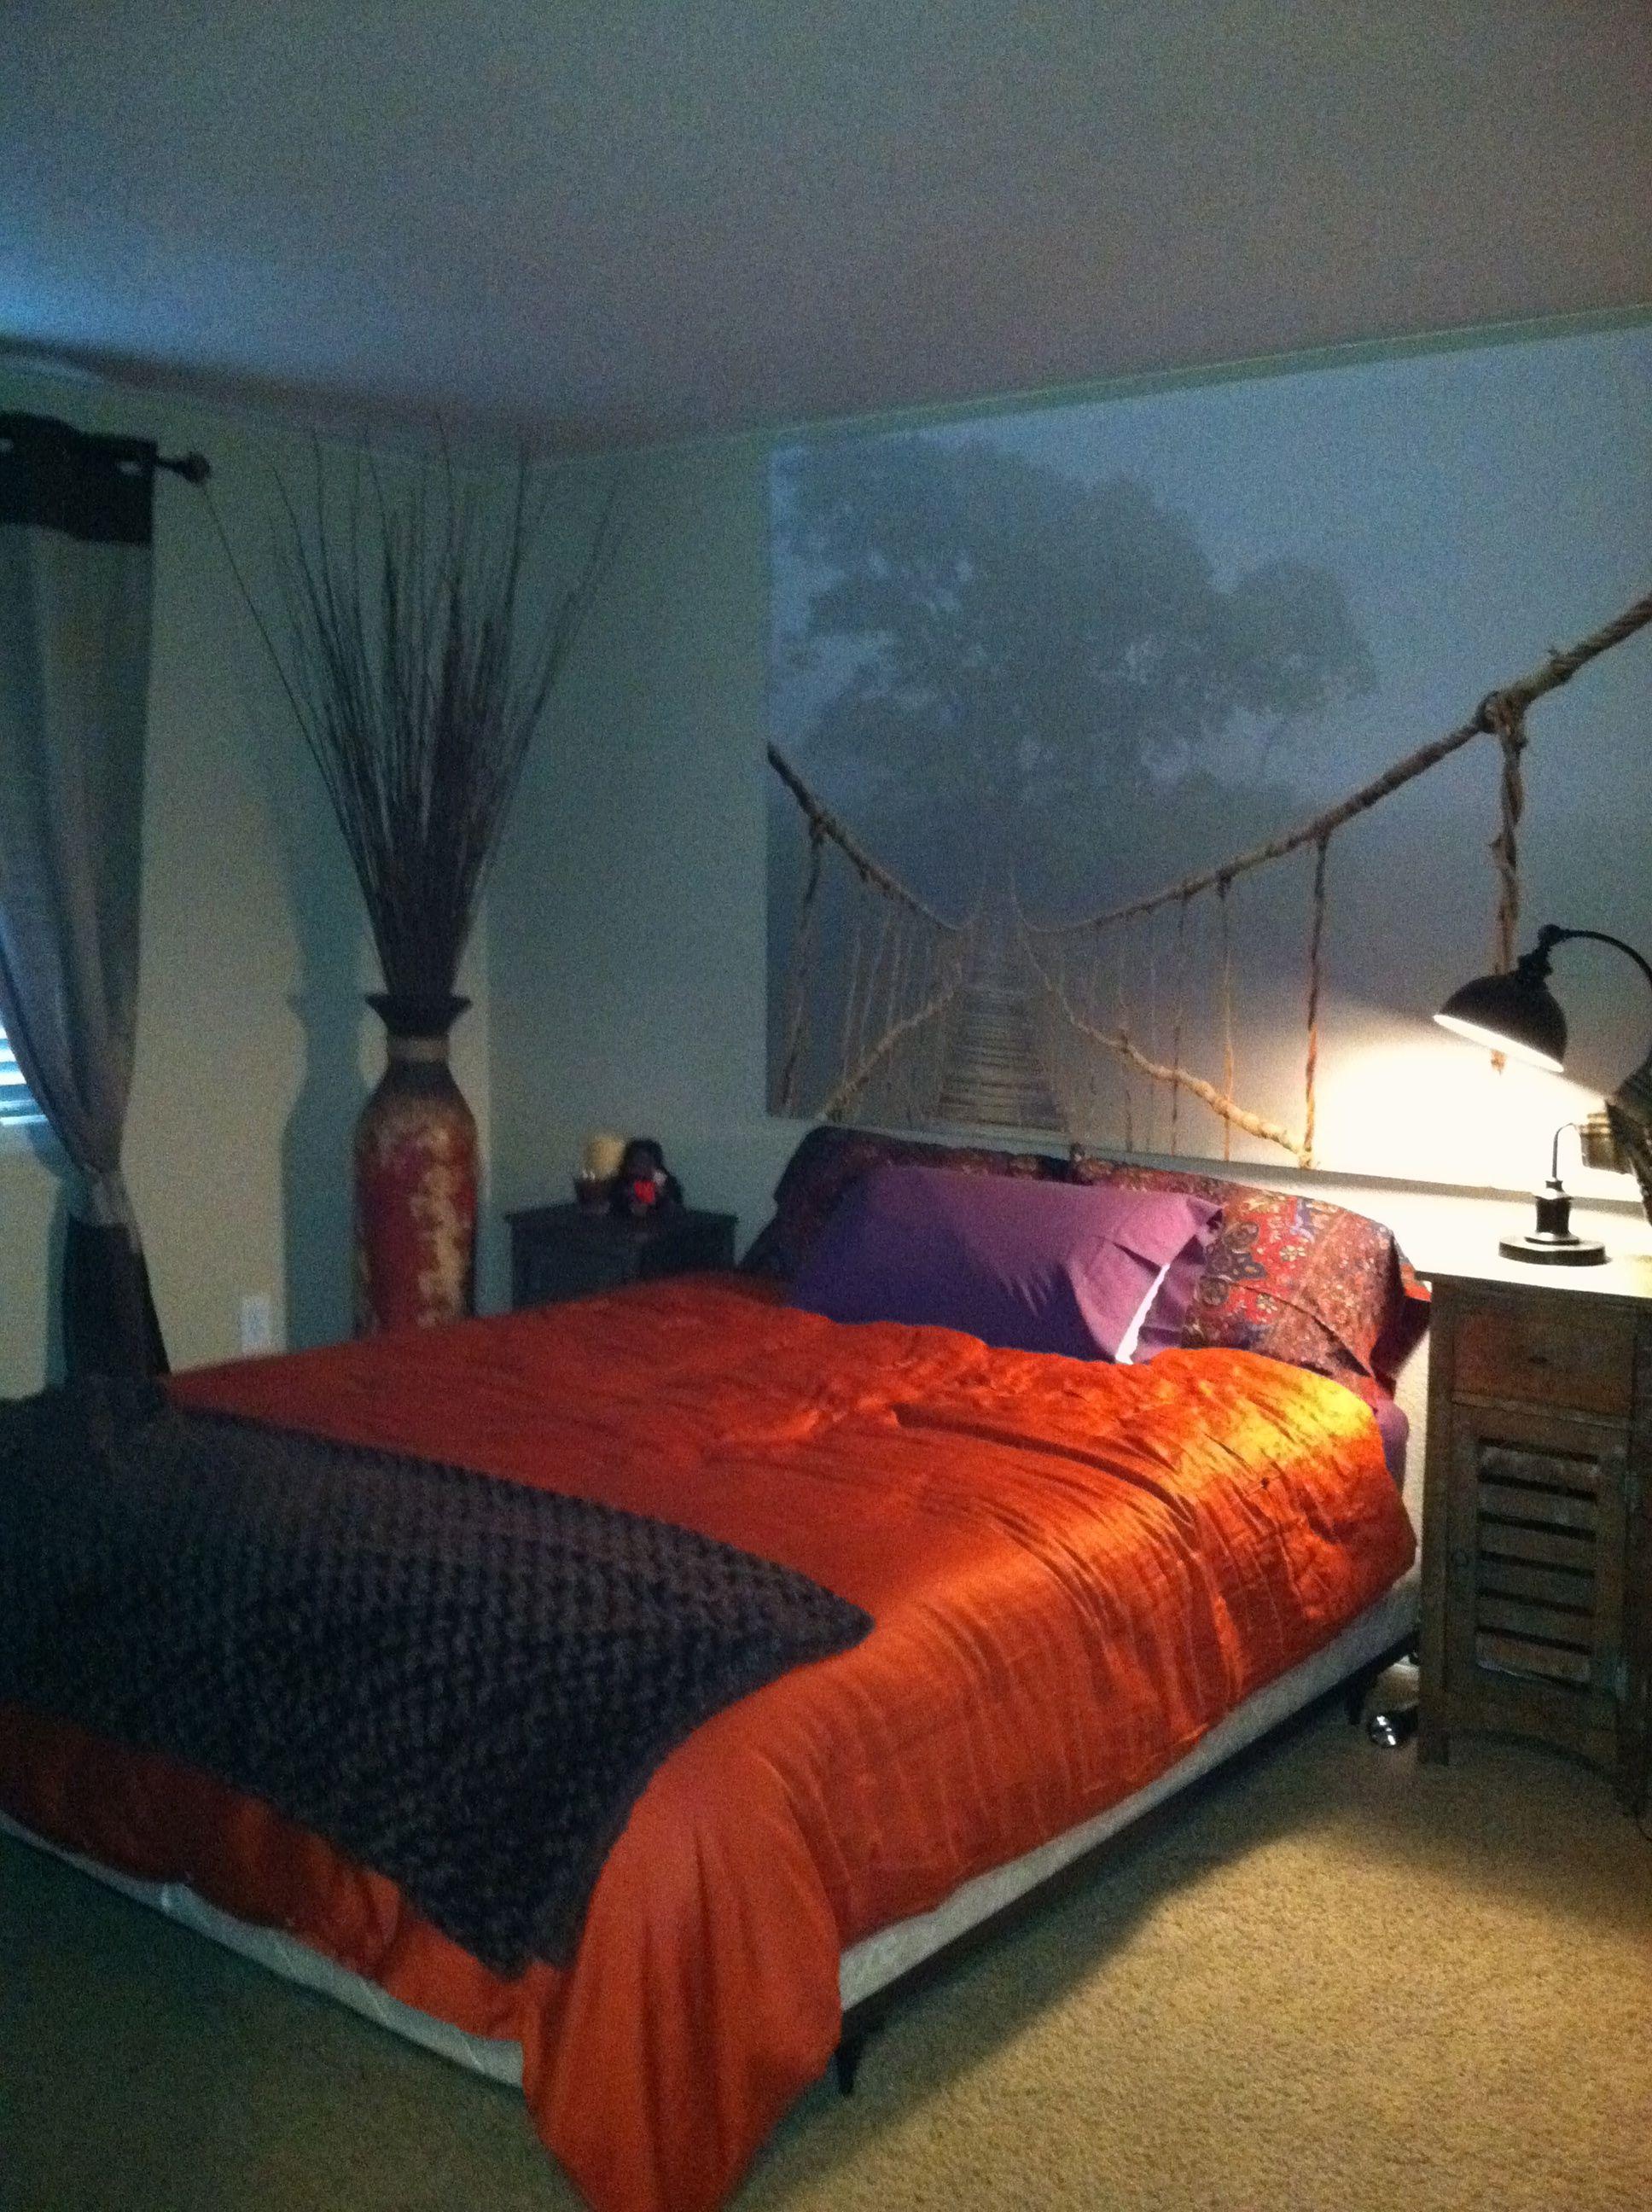 Bedroom 2157 Portland, Oregon #ericaseigred,#eyedesign ...